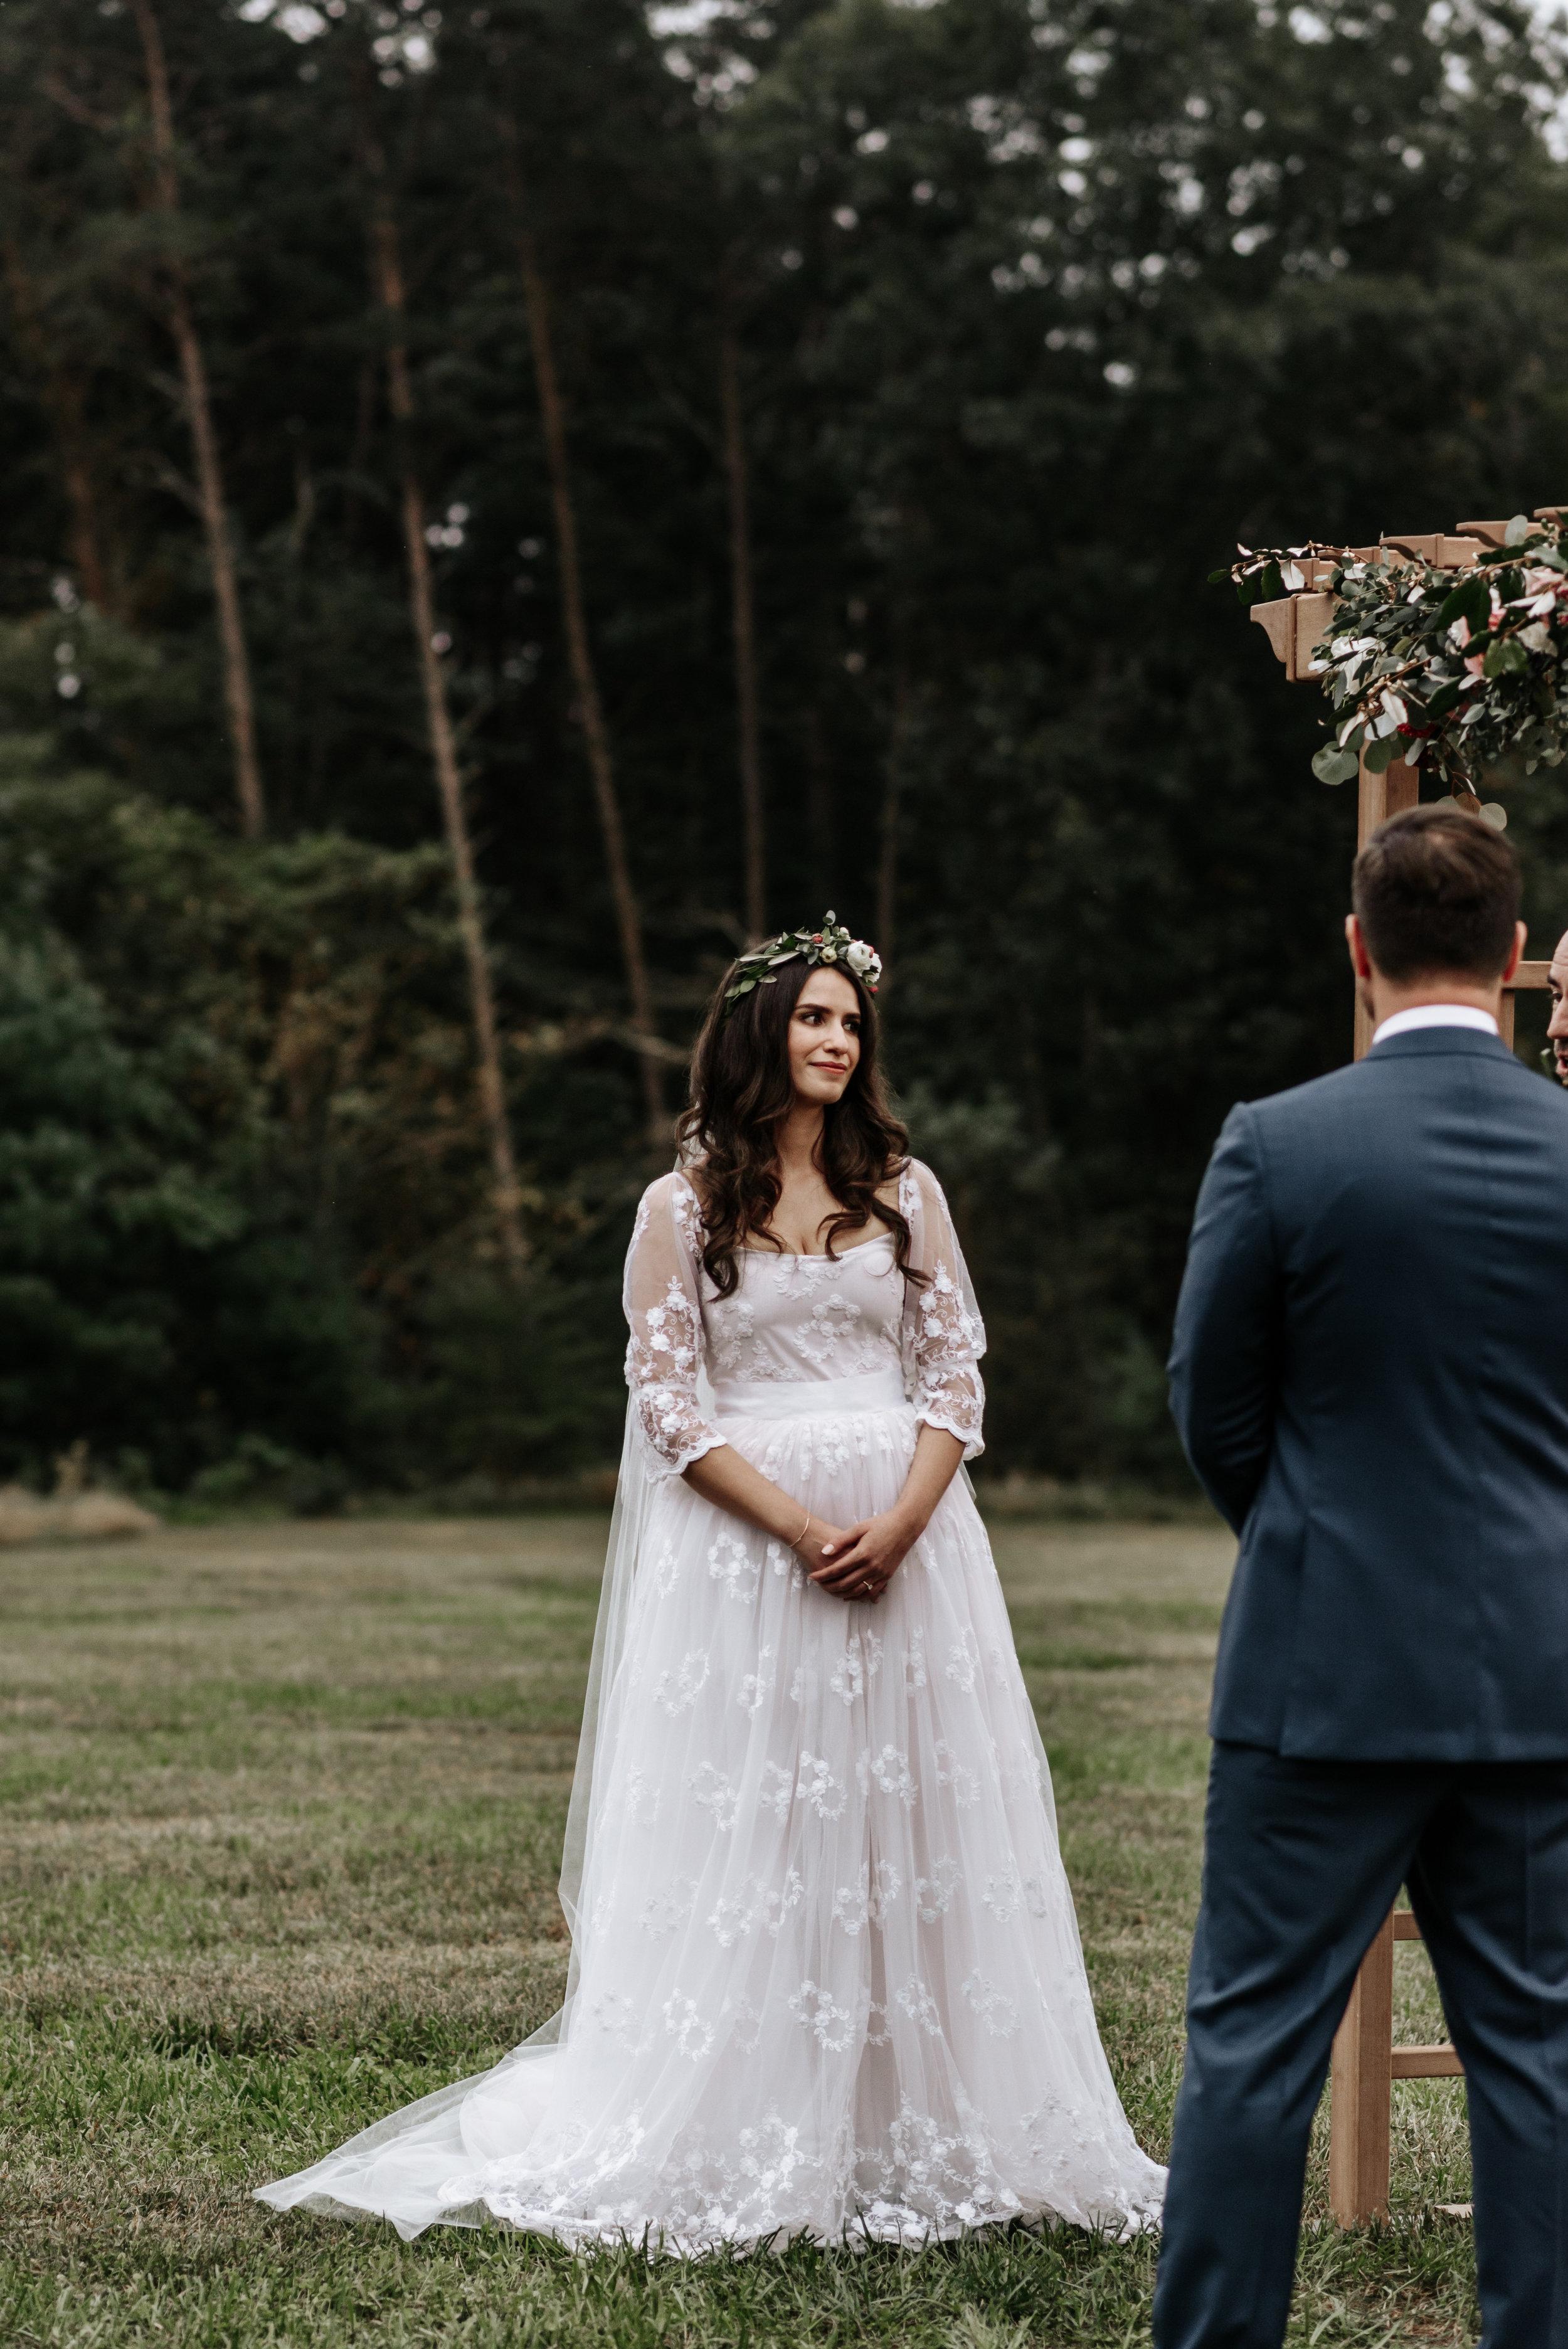 Veritas-Vineyards-and-Winery-Wedding-Photography-Afton-Virginia-Yasmin-Seth-Photography-by-V-2798.jpg